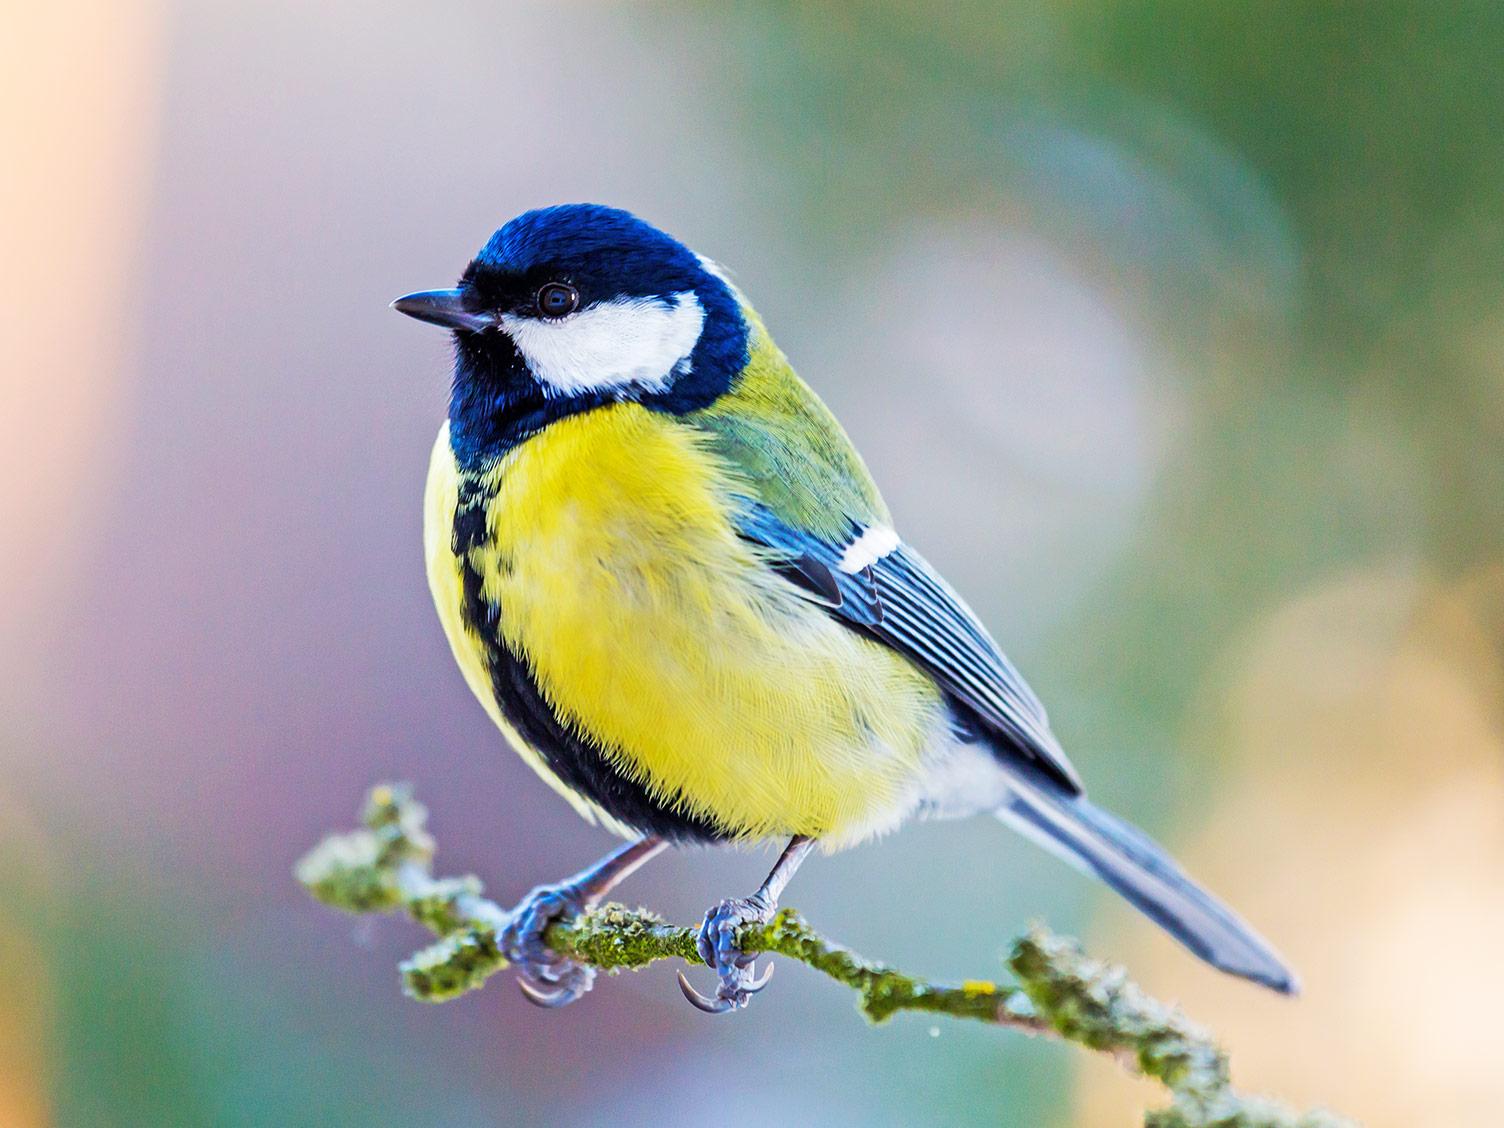 Blue Tit, bird